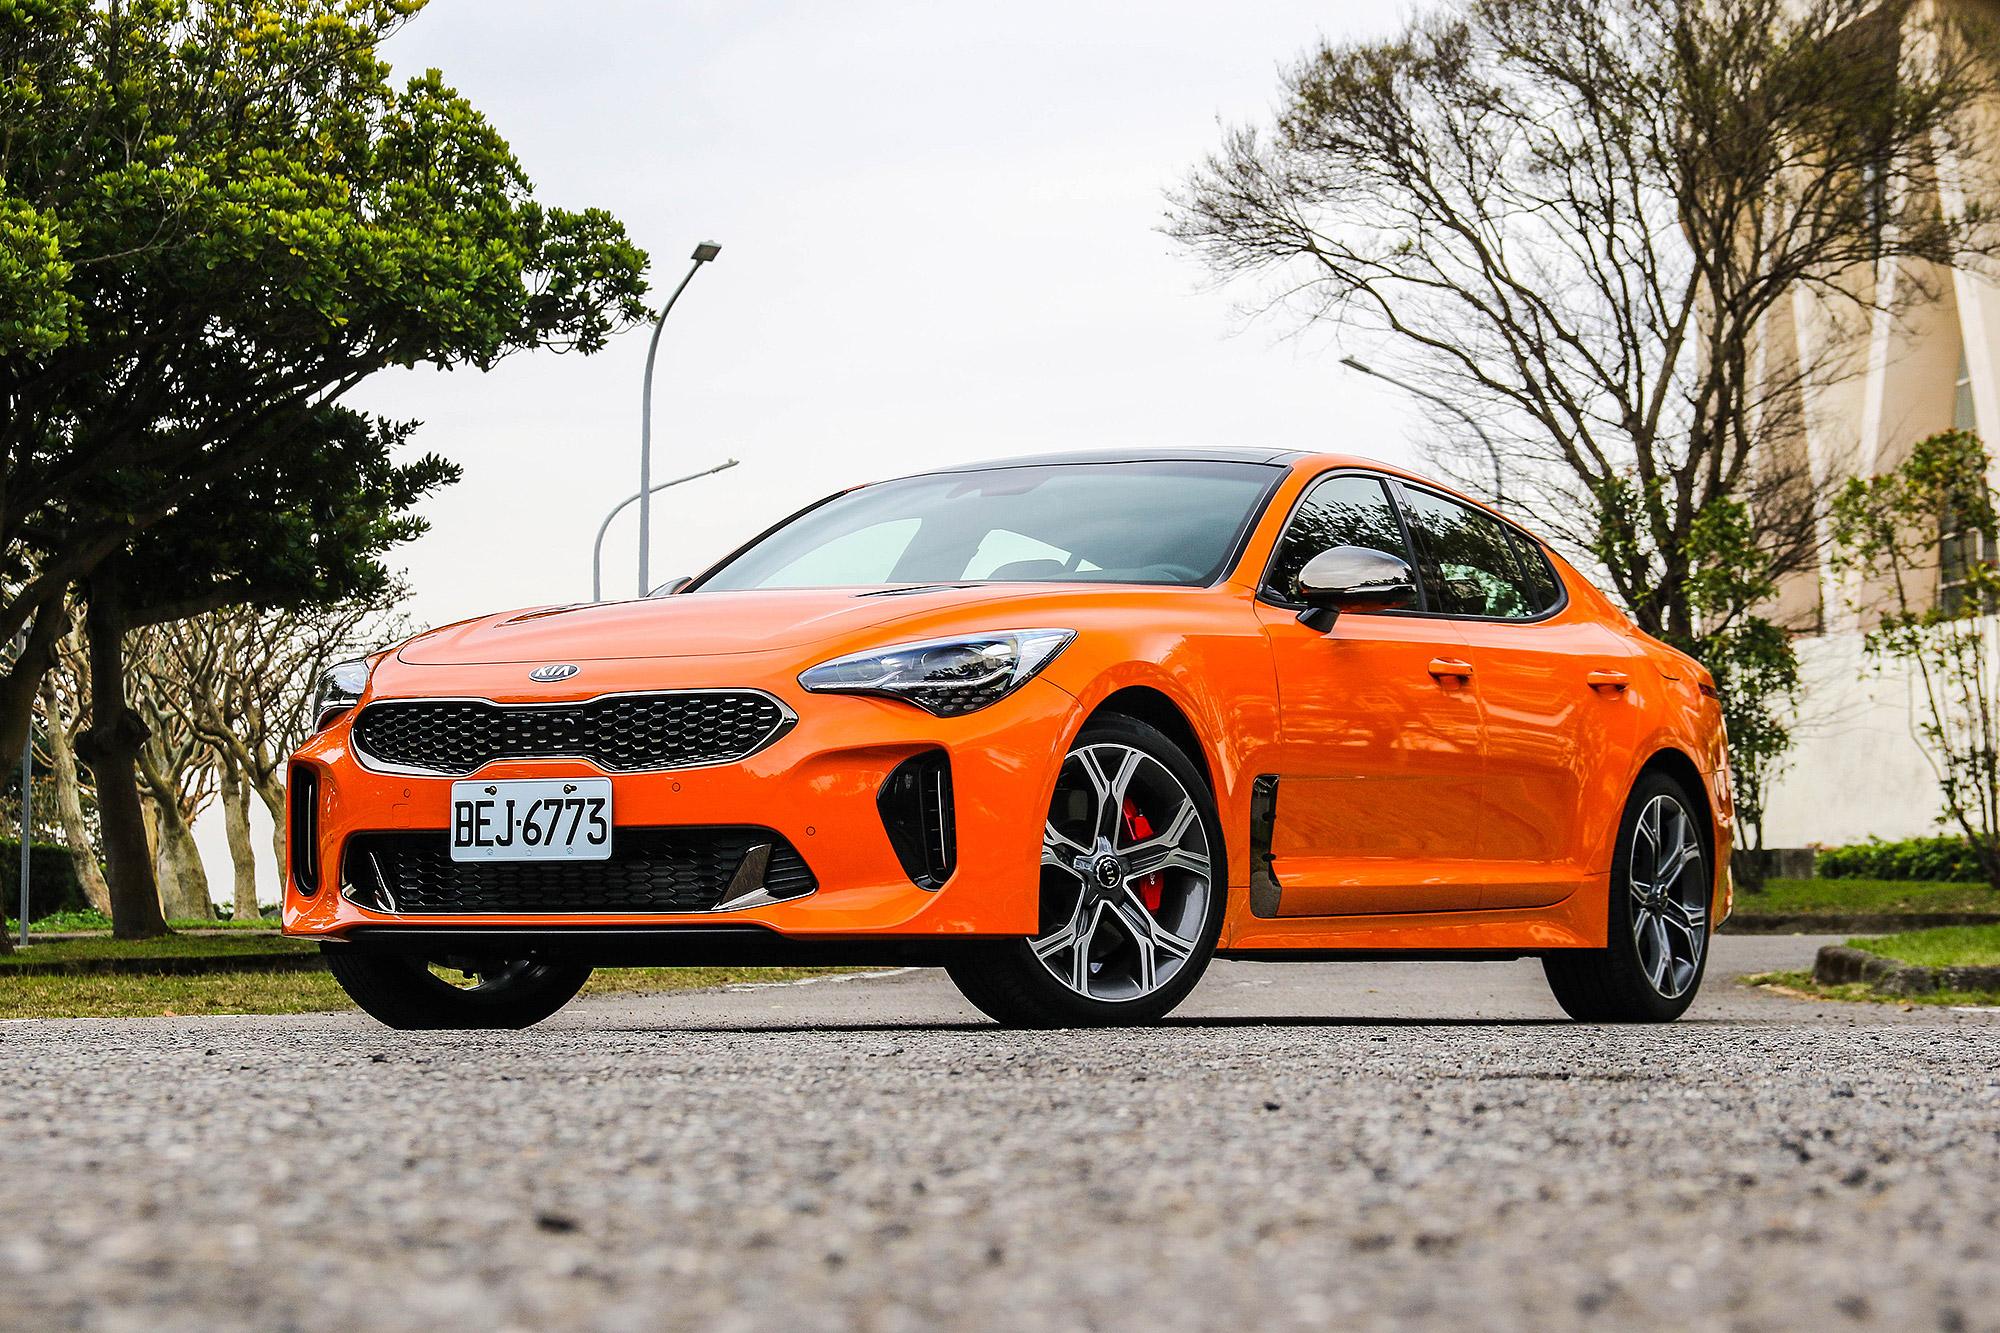 Stinger GT 雖然要價突破 200 萬元,卻是韓國品牌打入市場的另一種突破口。